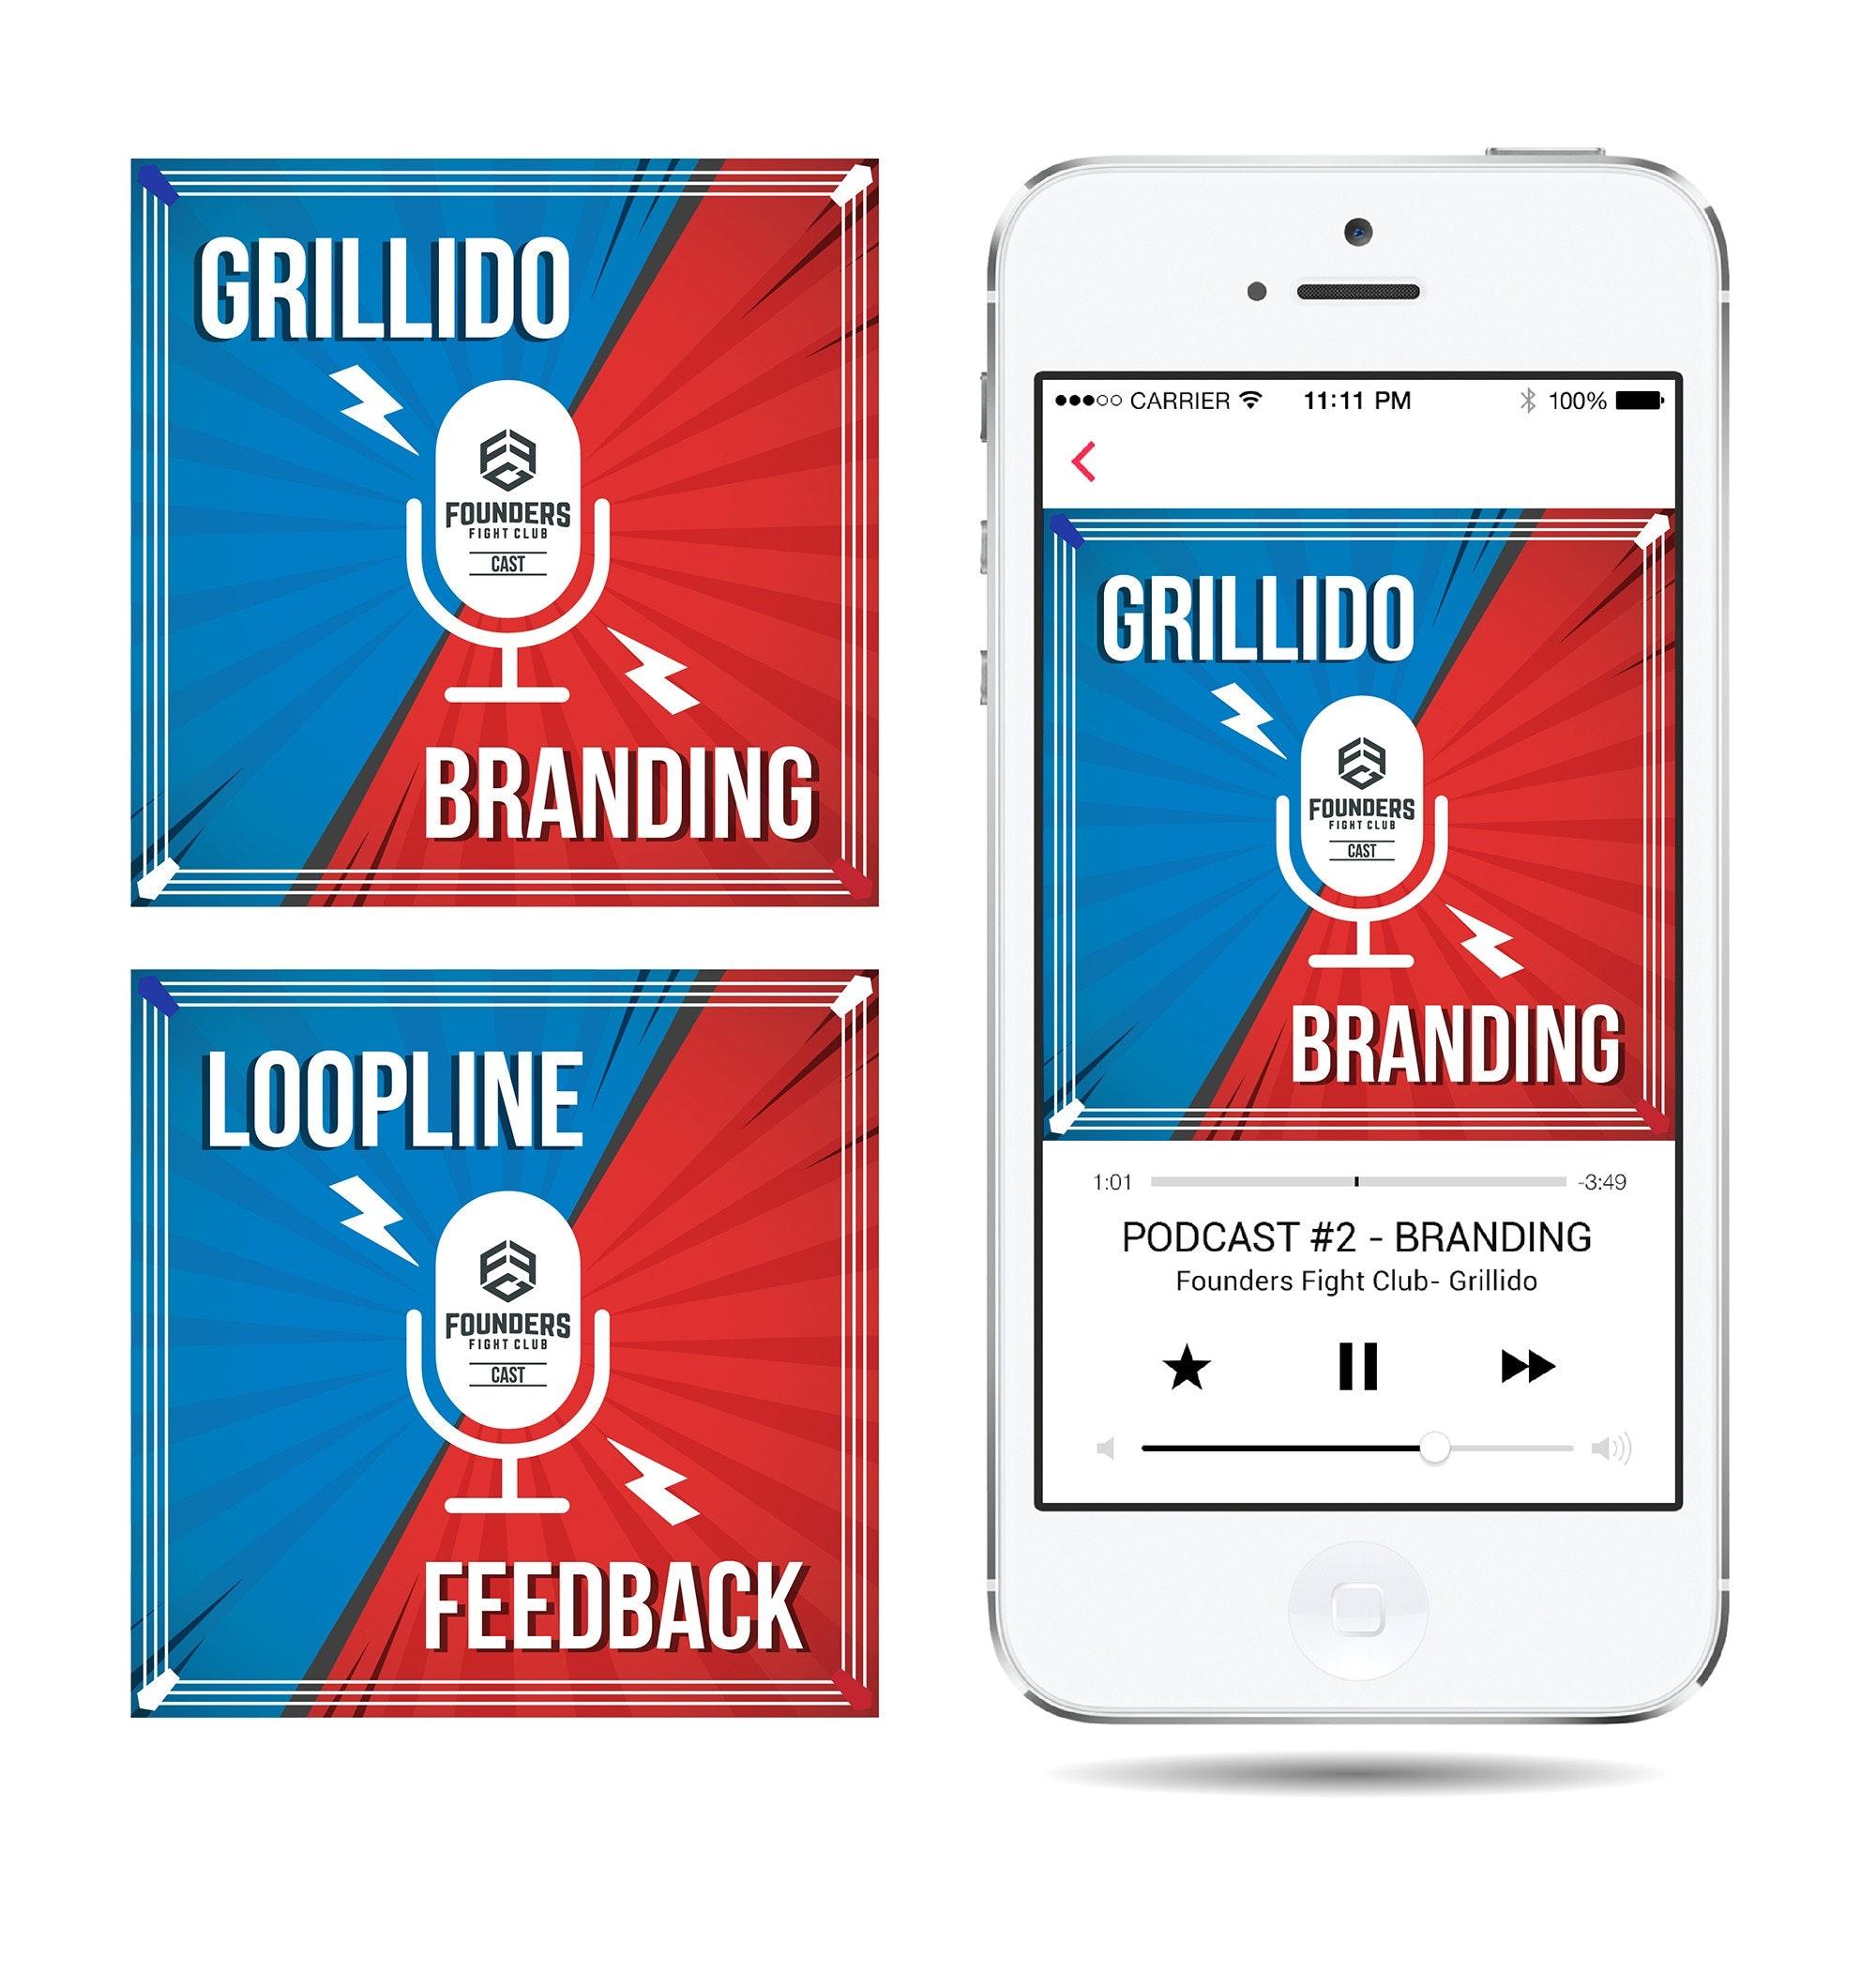 Grillido Branding artwork